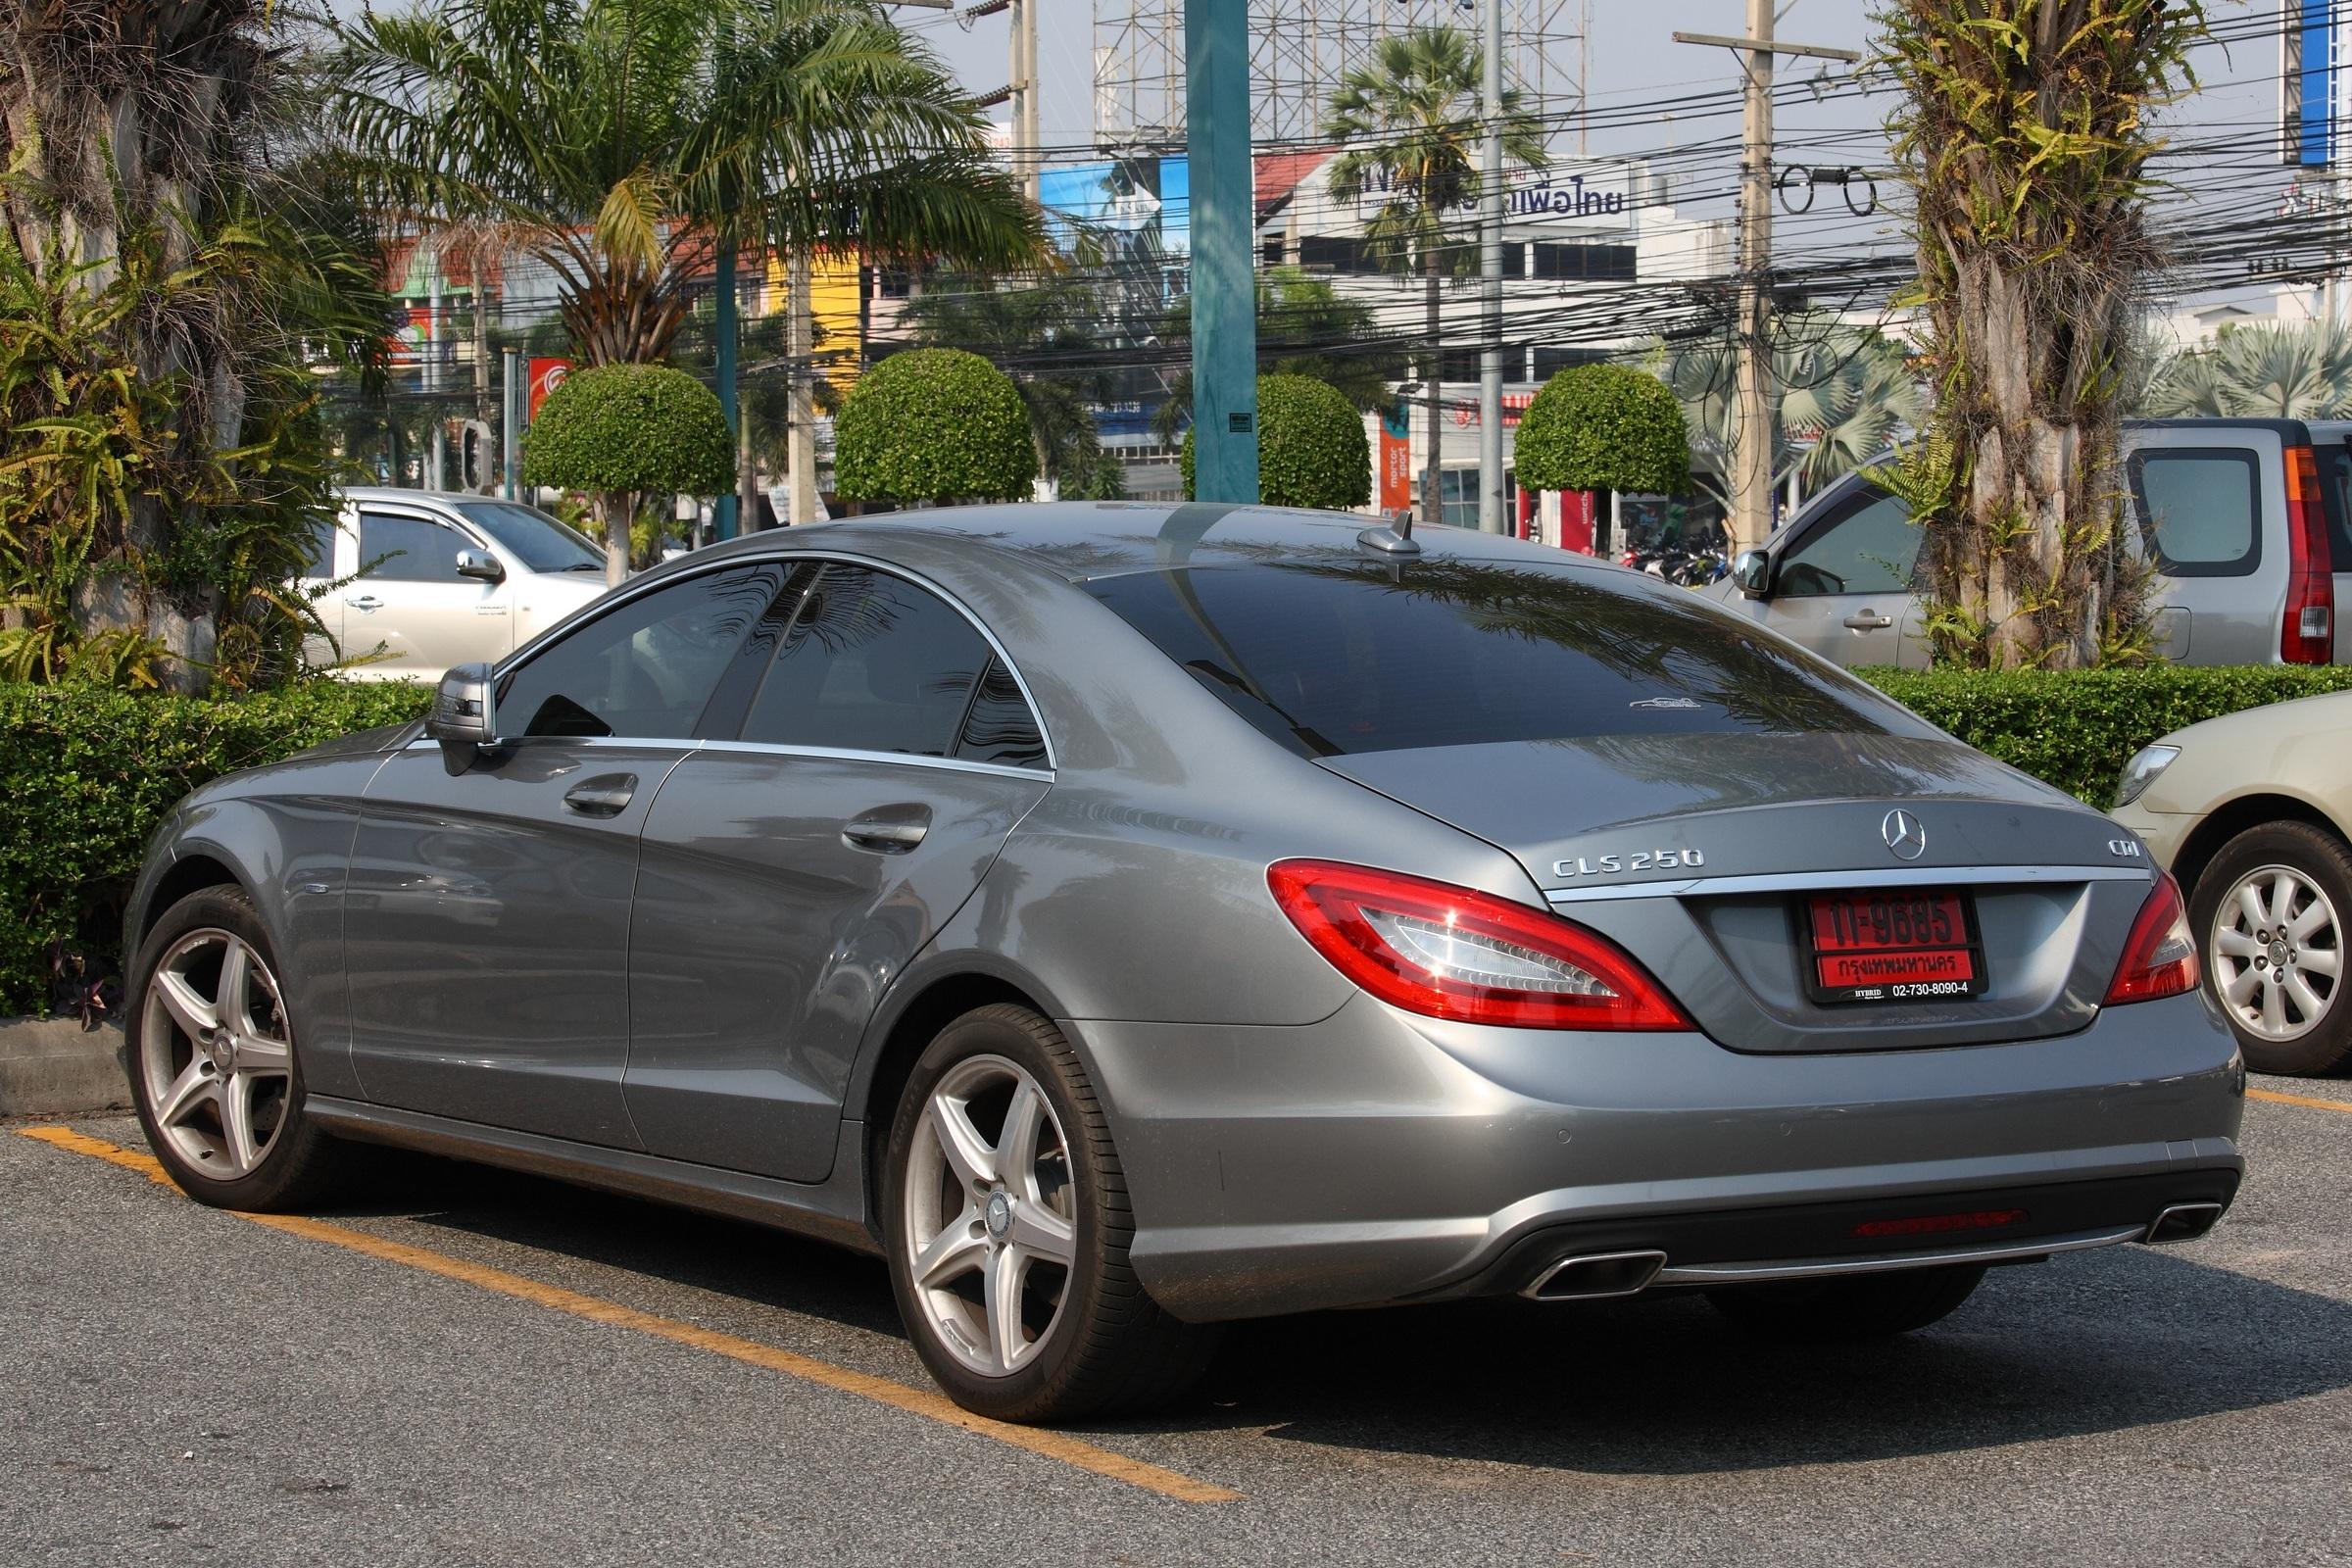 File mercedes benz cls 250 in pattaya jpg wikipedia for Mercedes benz e 250